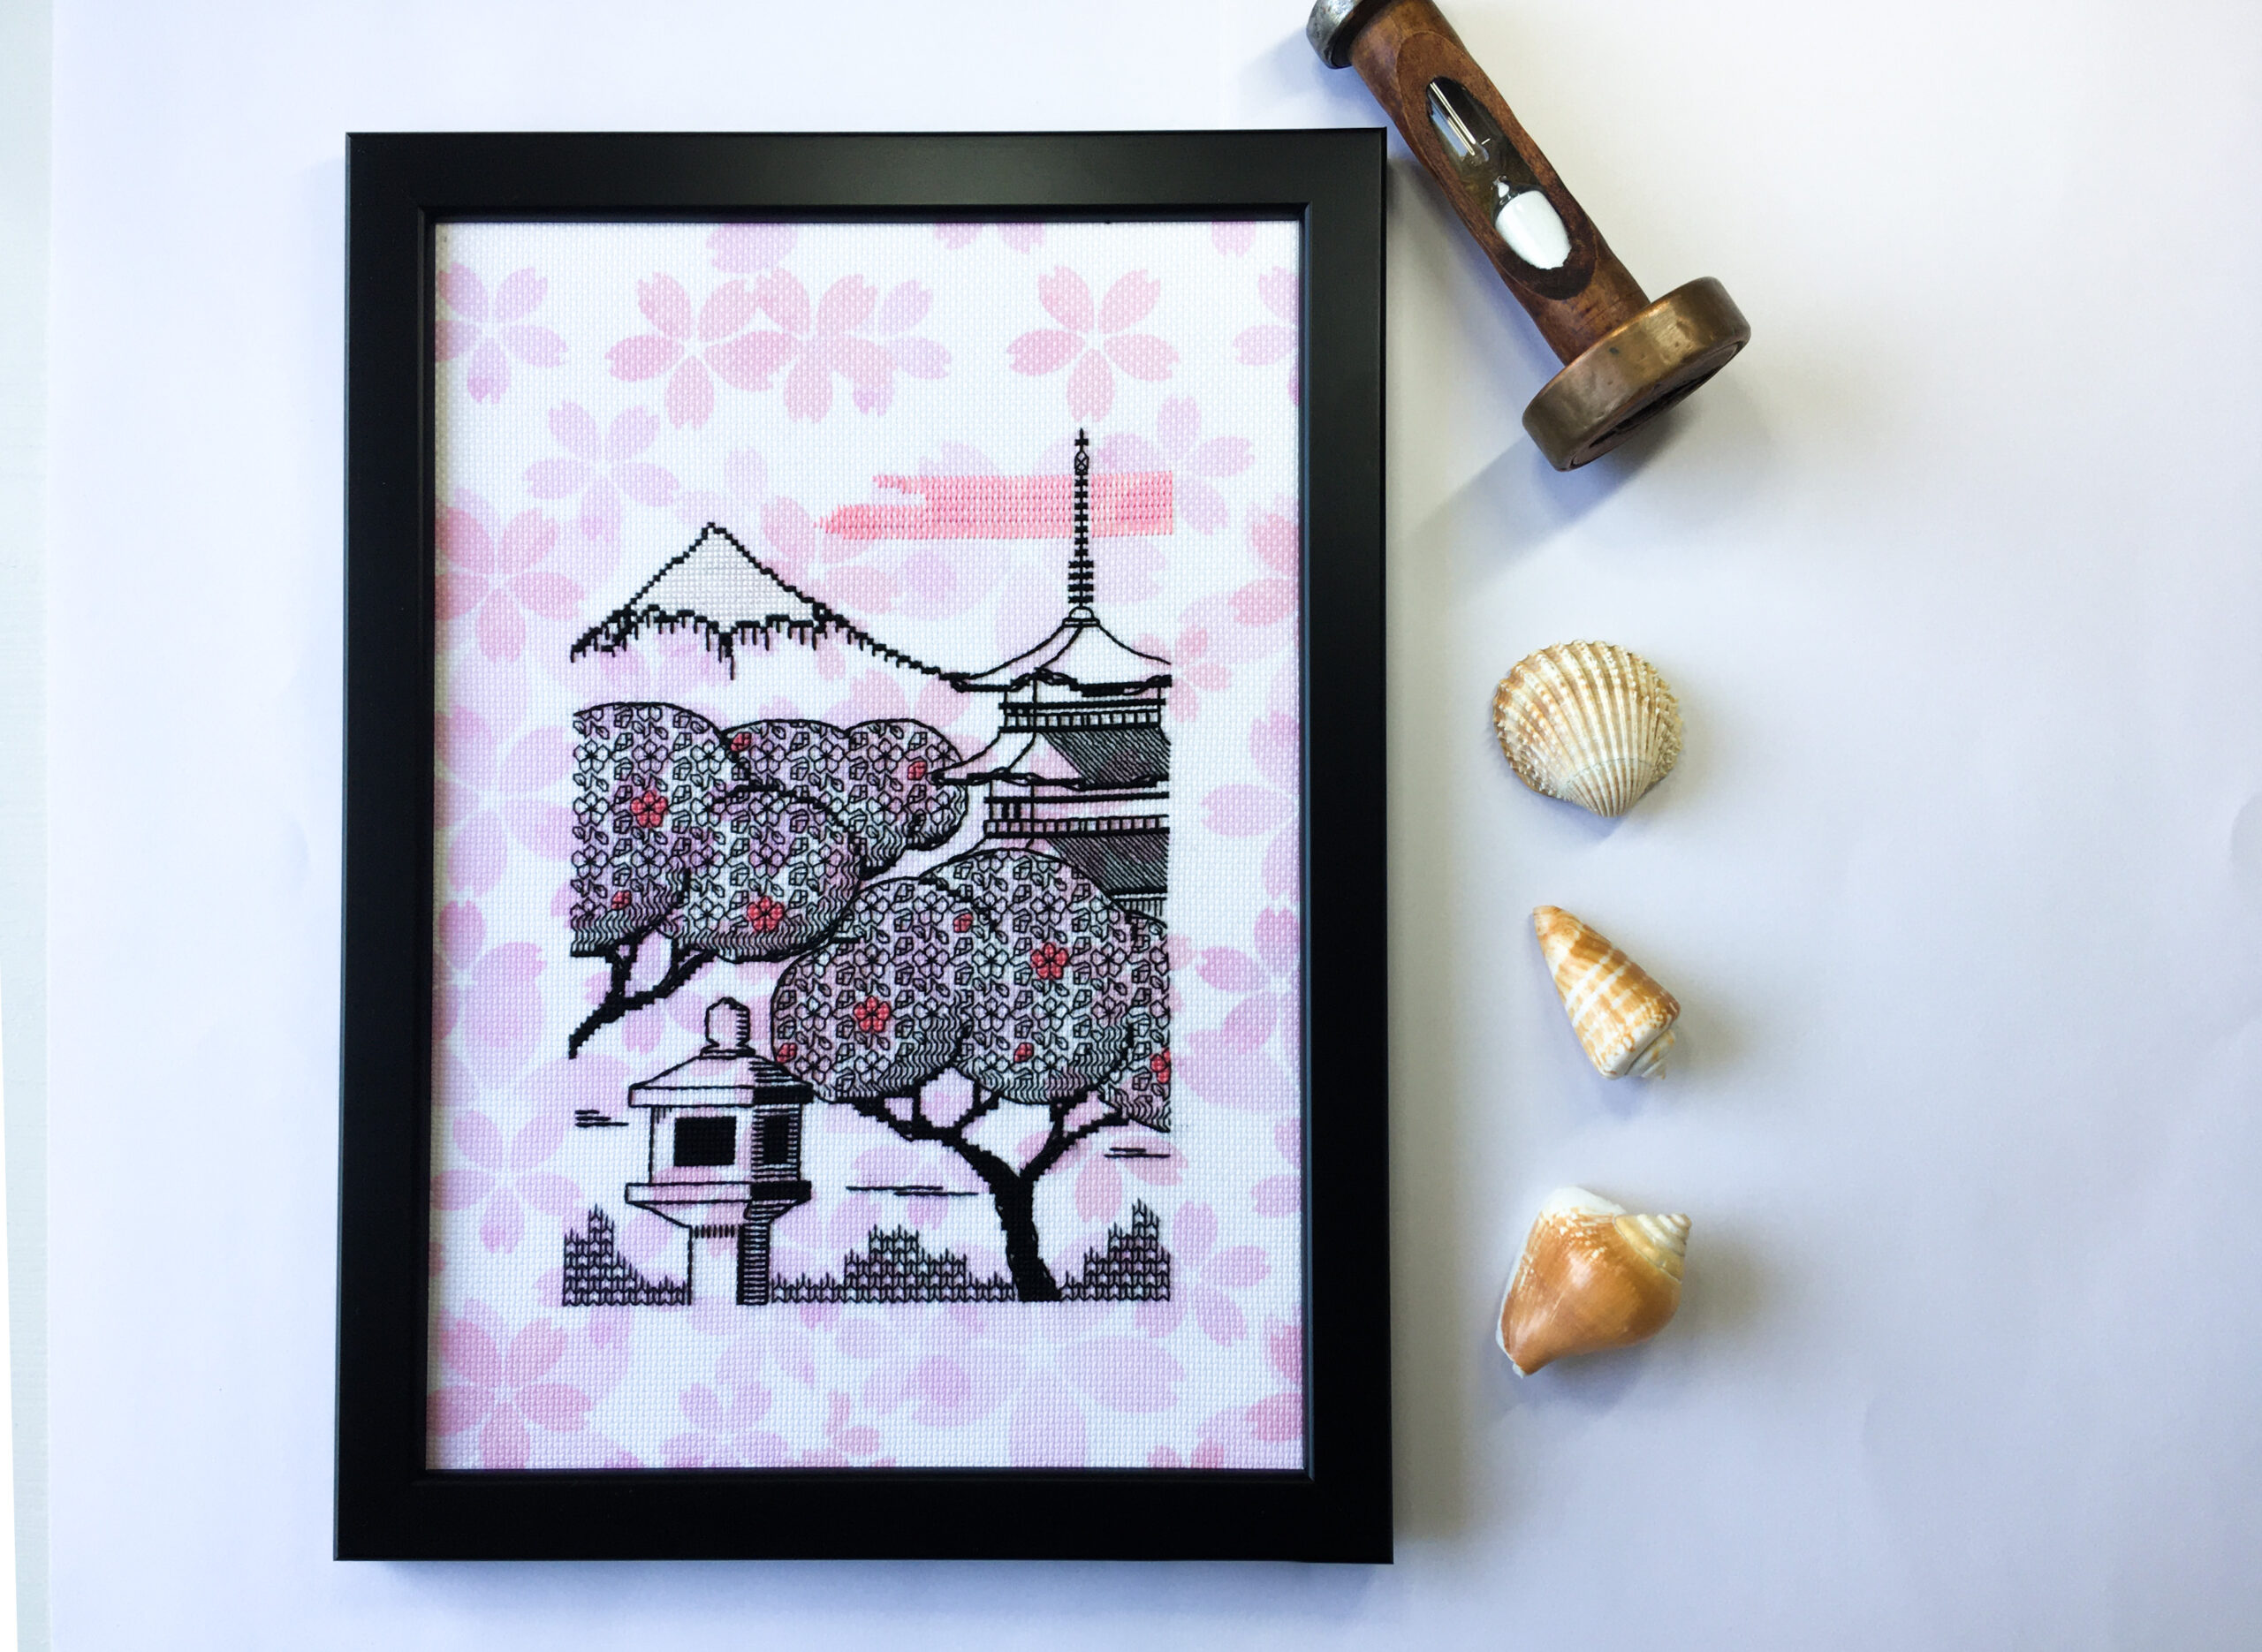 Sakura Morning blackwork embroidery kit